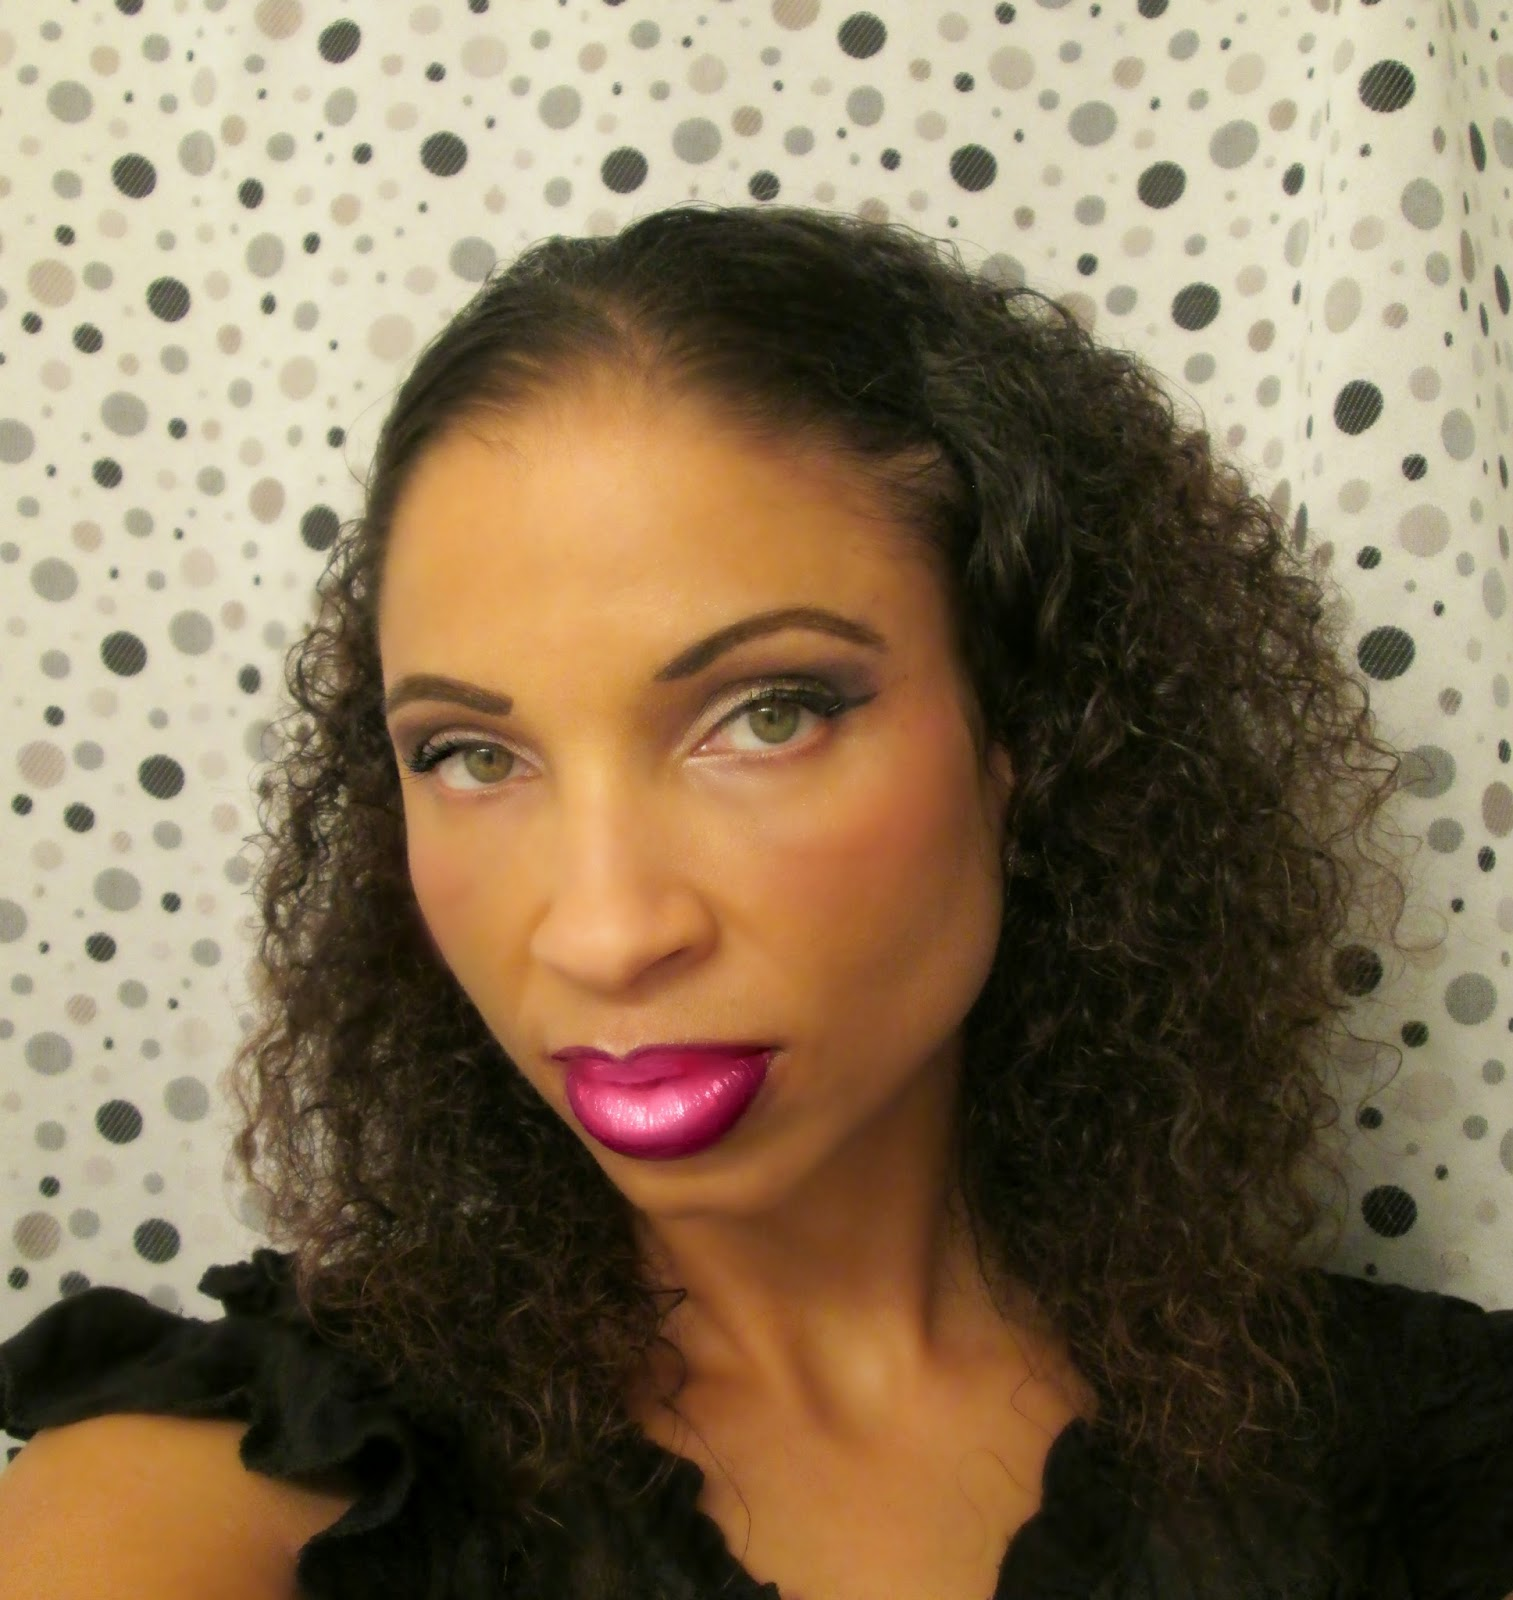 http://chrysalisglam101.blogspot.com/2014/11/ombre-lips.html